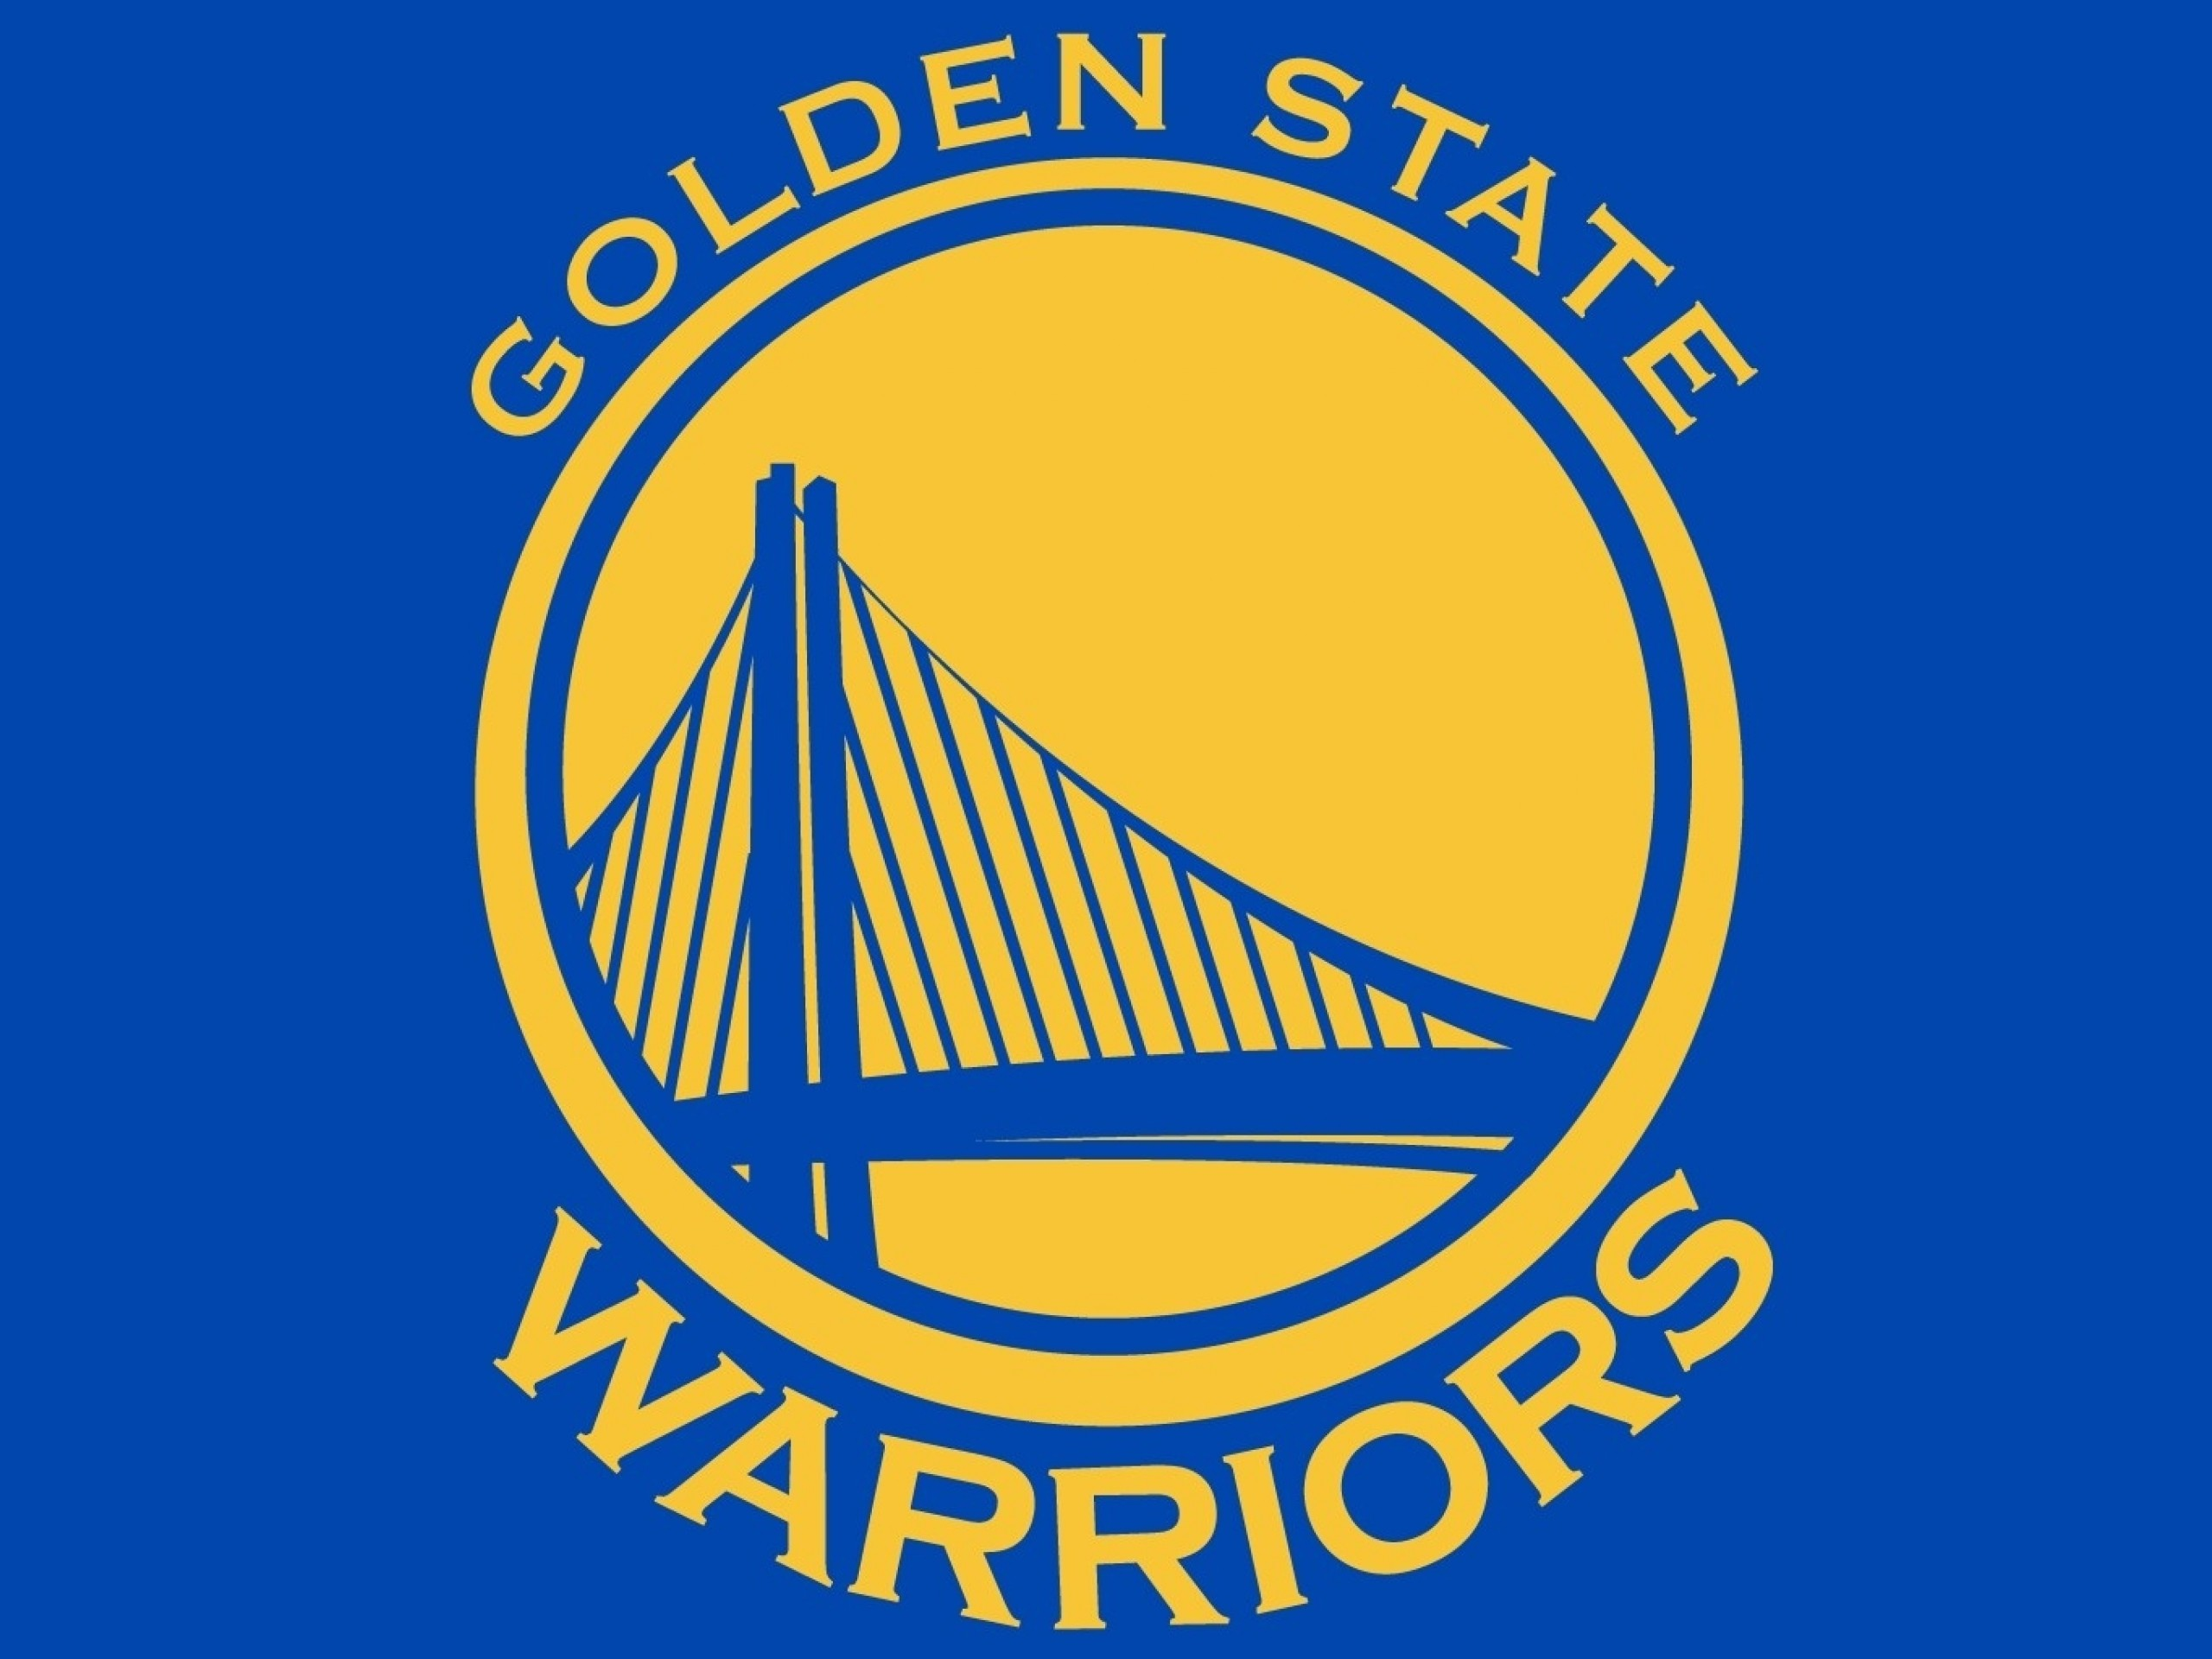 Golden State Warriors Iphone Wallpaper 71 Images